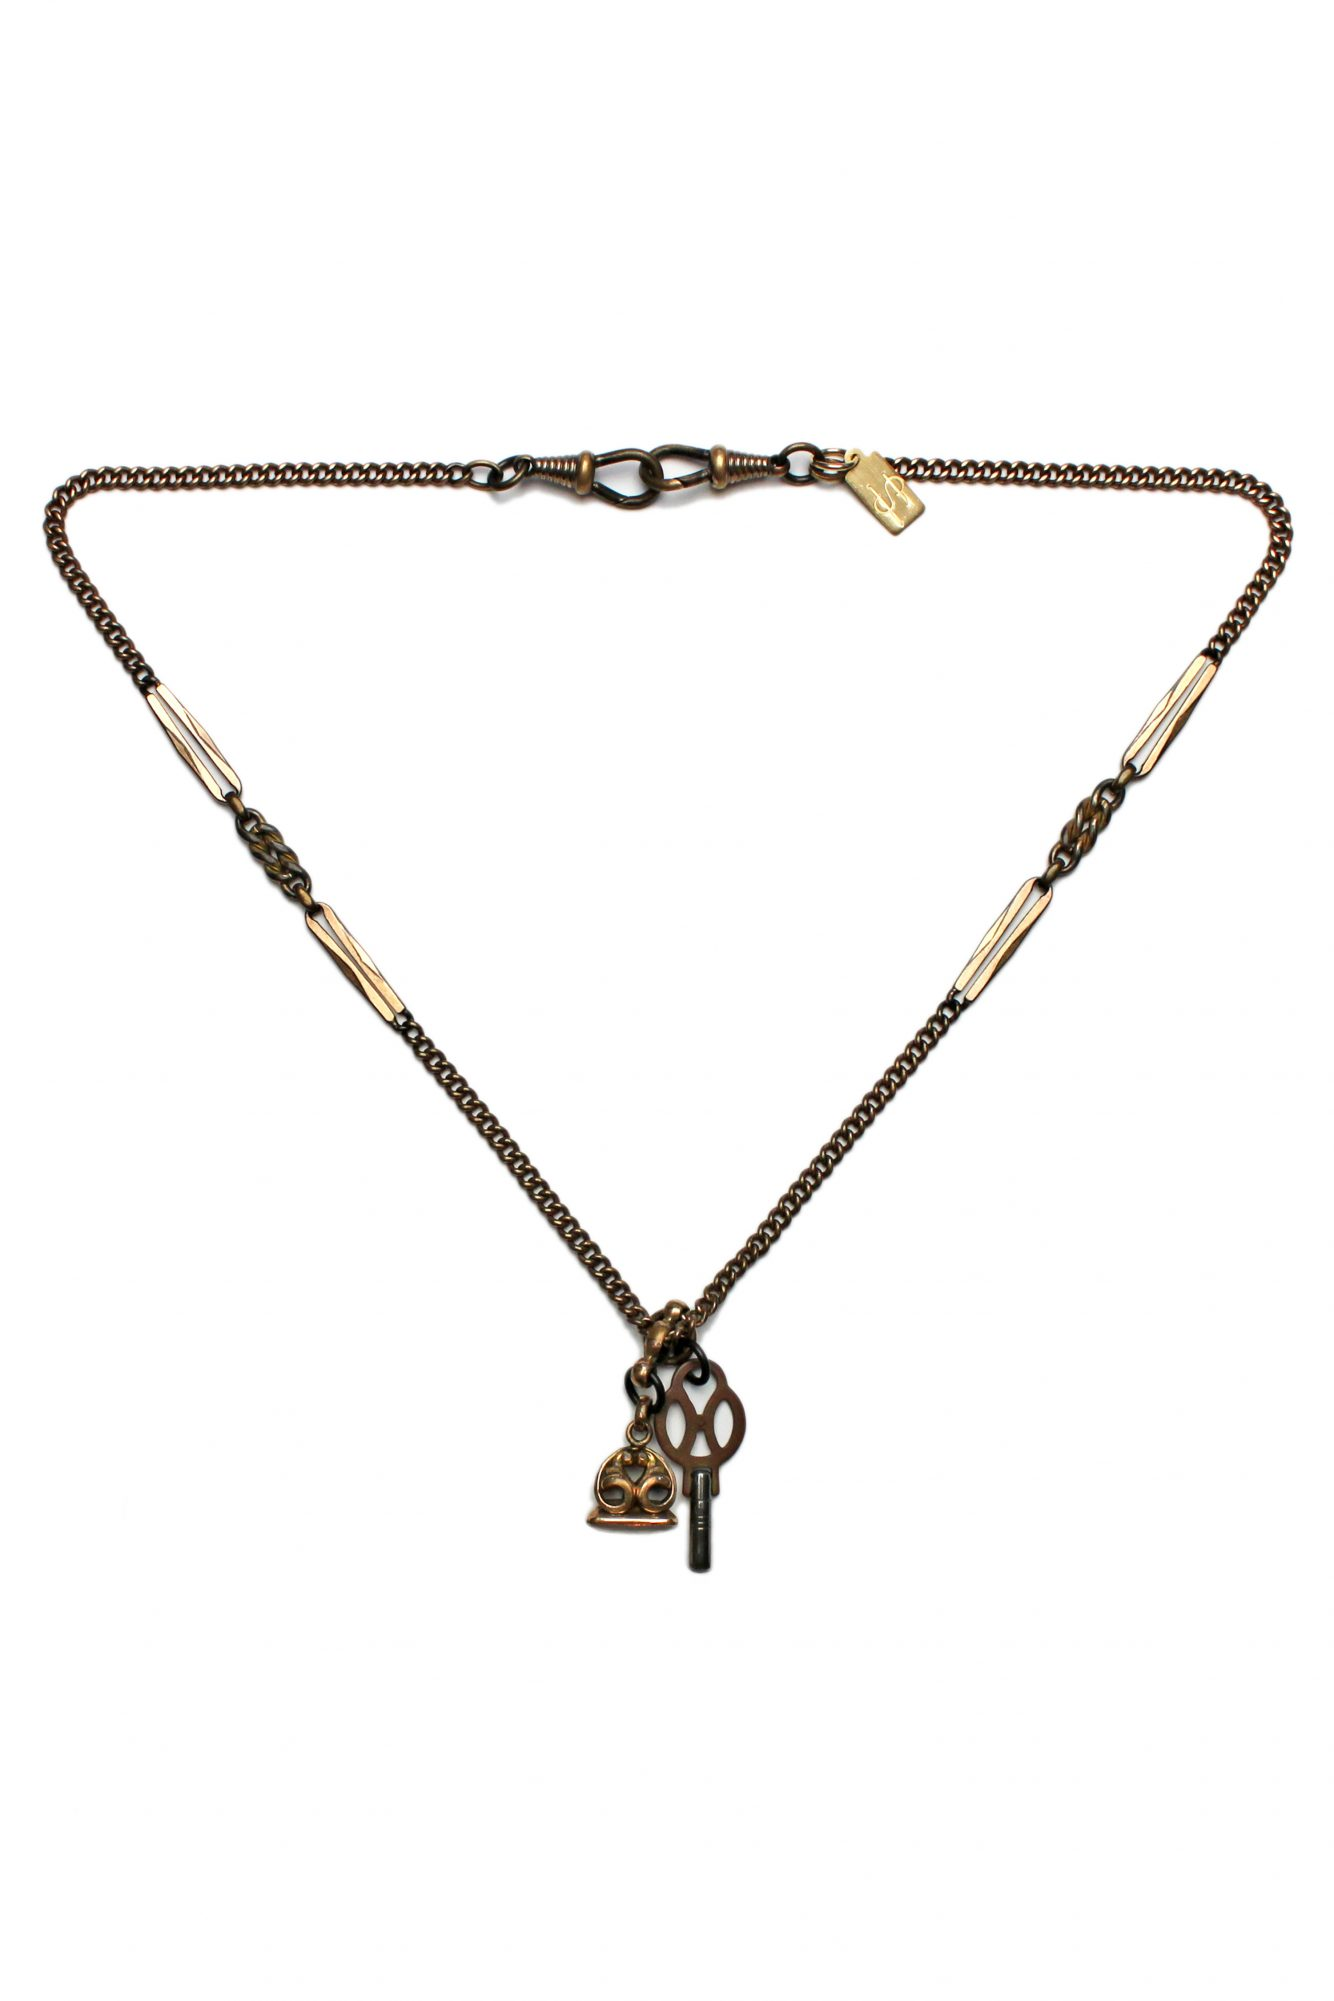 KeyNecklace